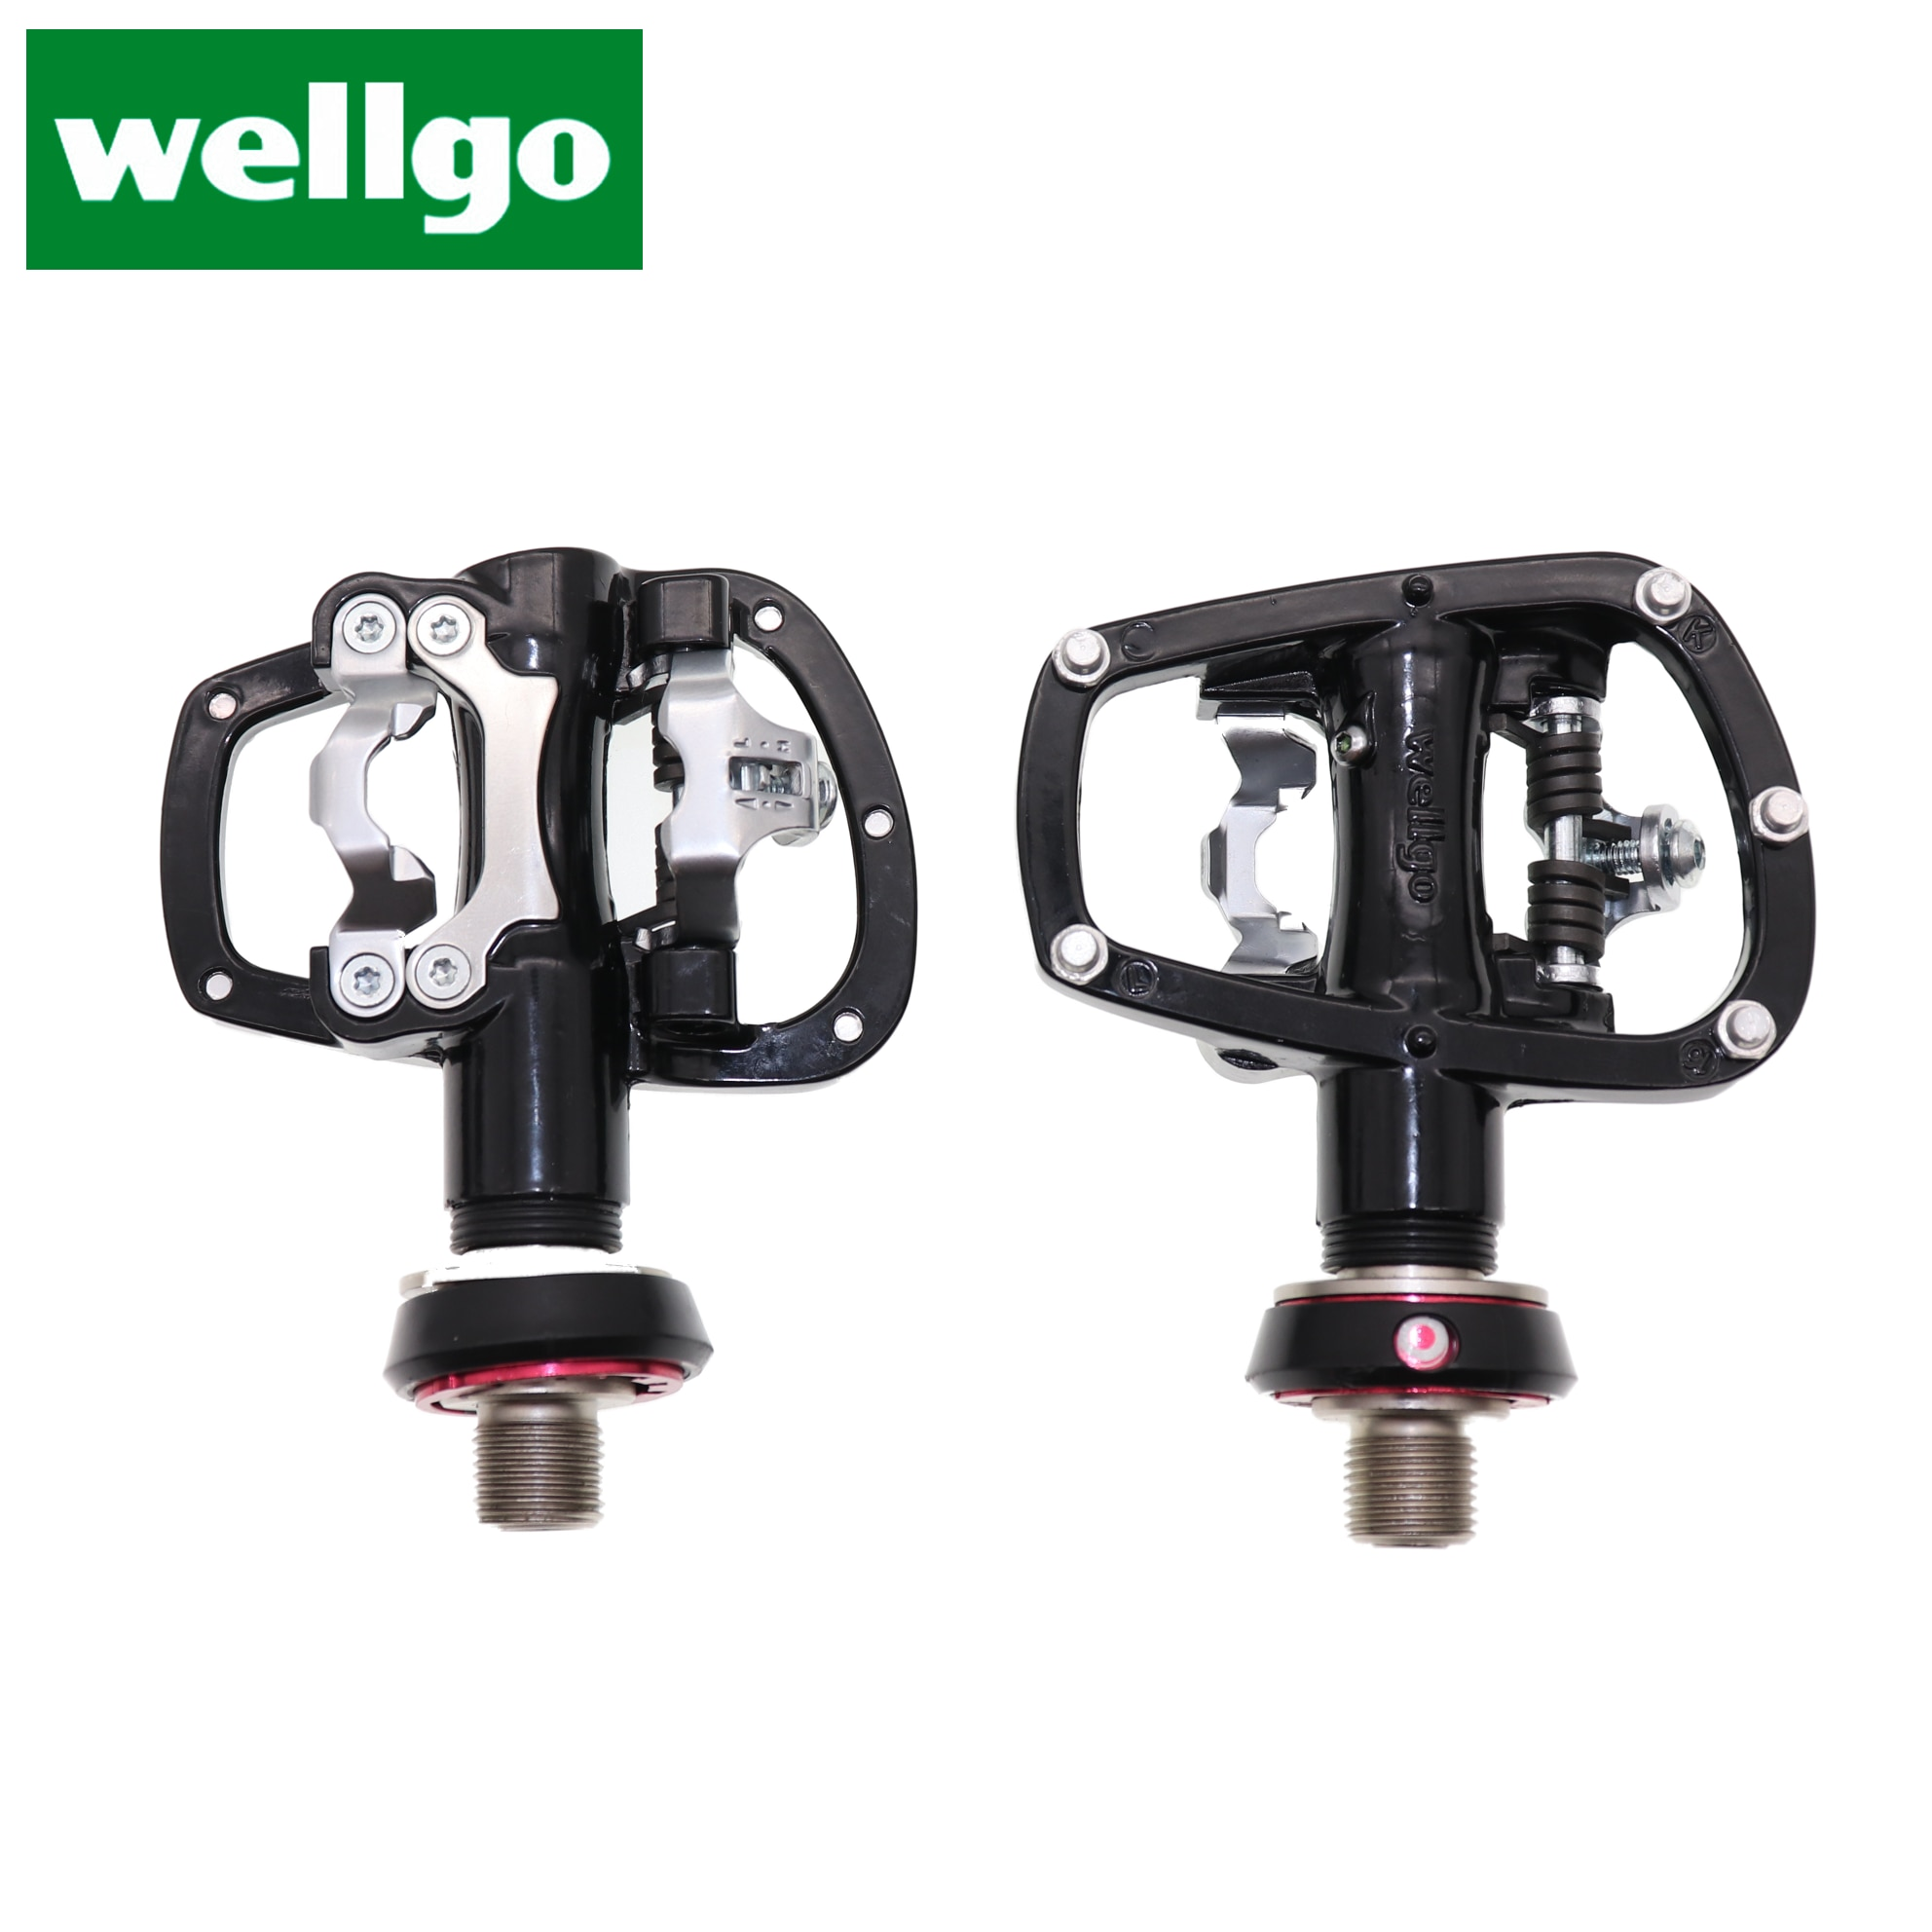 Wellgo Pedal Quick Release Gerät R120B Nicht QRD QRD2 Mountainbike rennrad Pedal MTB Radfahren Lager Pedale leichte